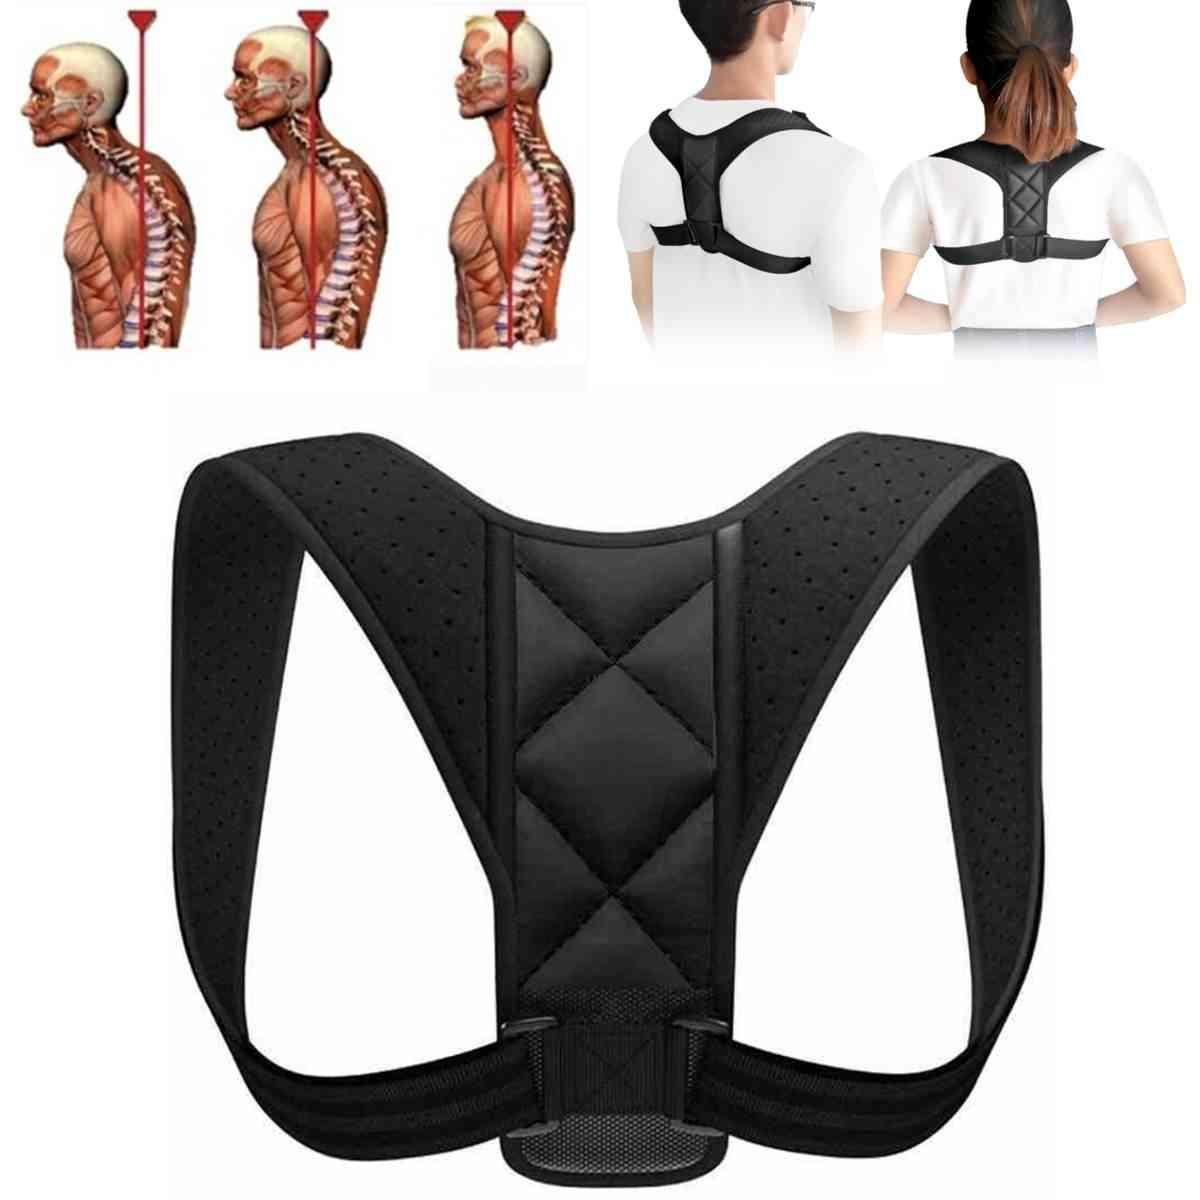 Kyphotone Back Correction Band Posture Brace, Anti Humpback Clavicle